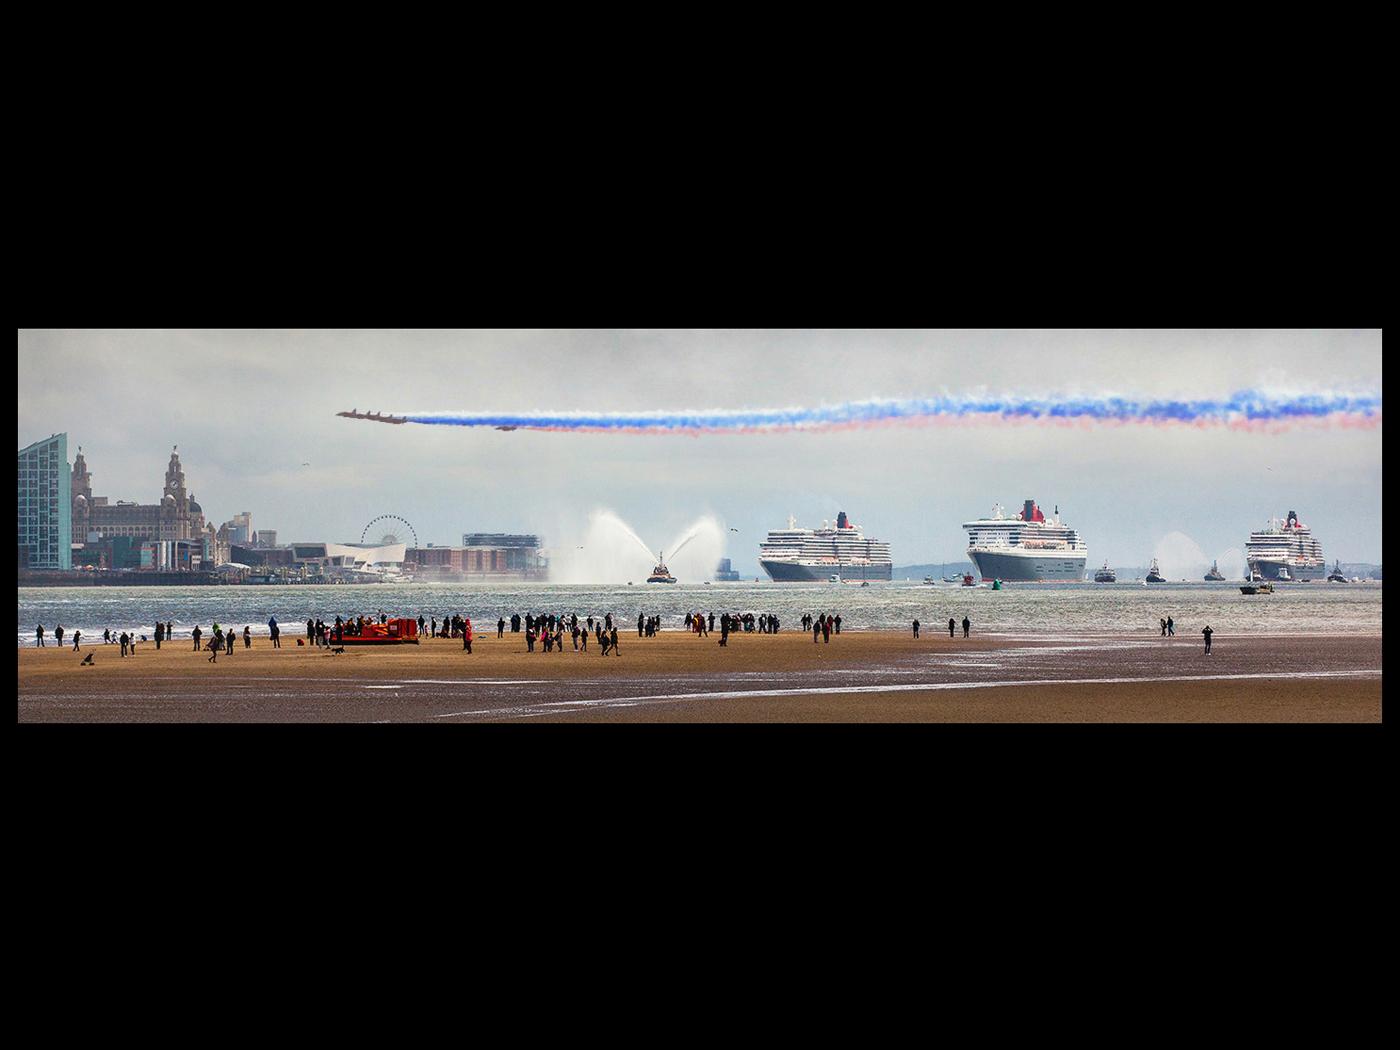 Liverpool receives Cunards Salute